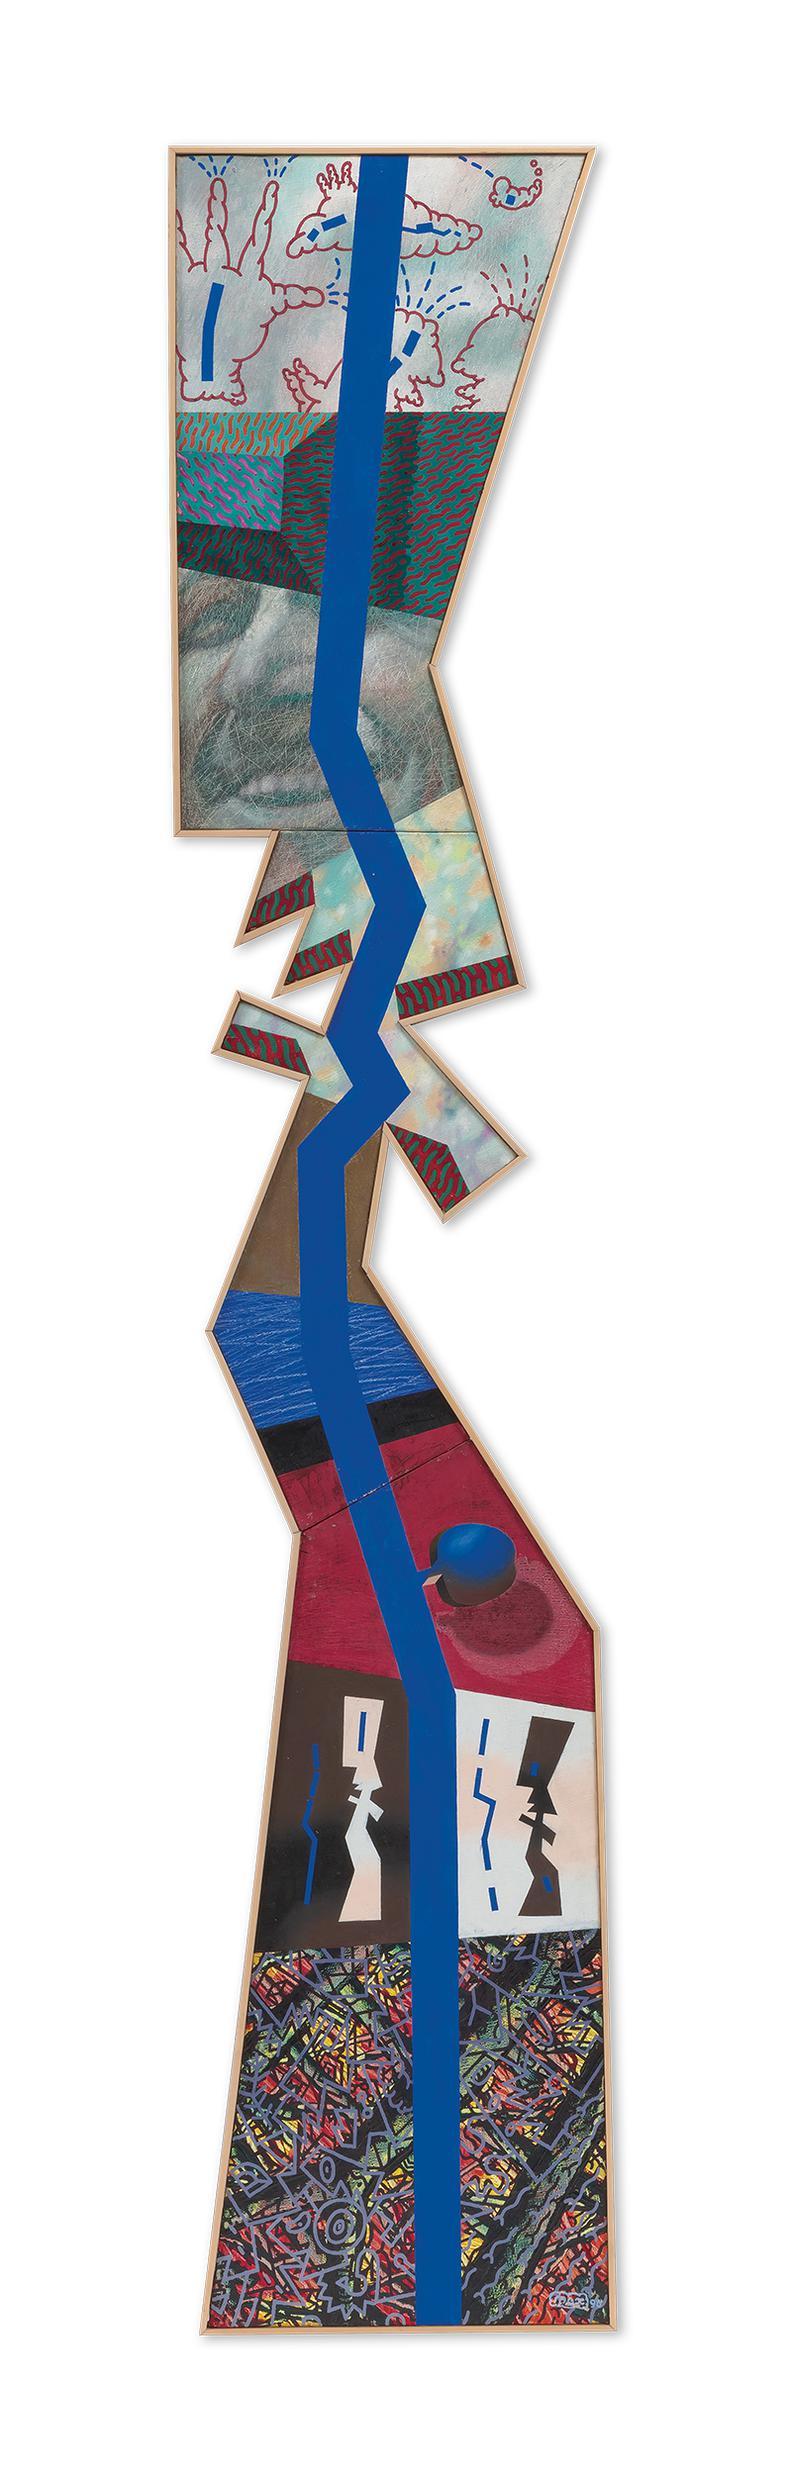 A. M. Moxob - Blue Line-1990